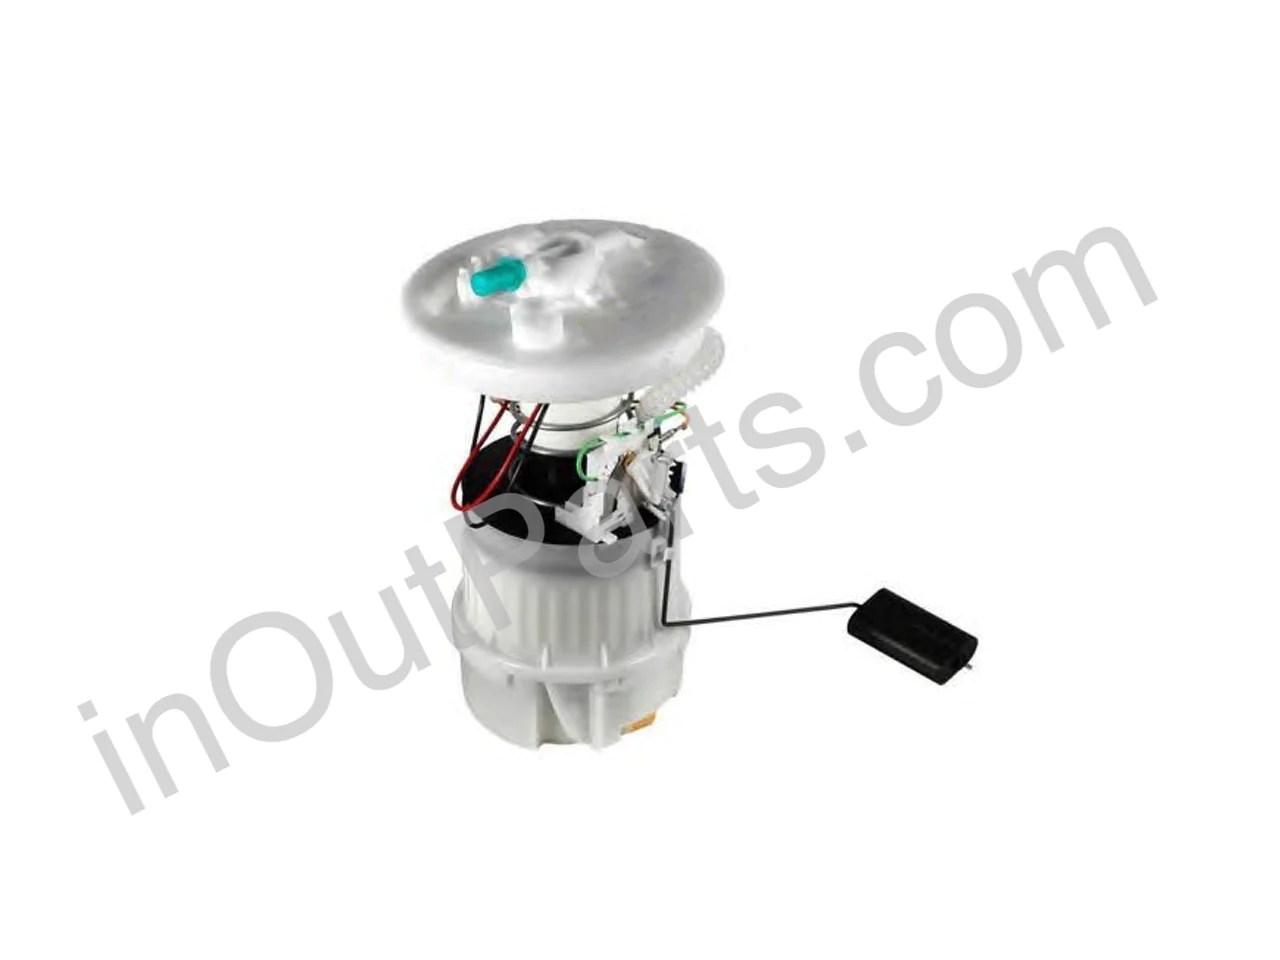 medium resolution of fuel filter fits ford focus 2005 2006 2007 2008 2009 2010 2011 c max inout parts